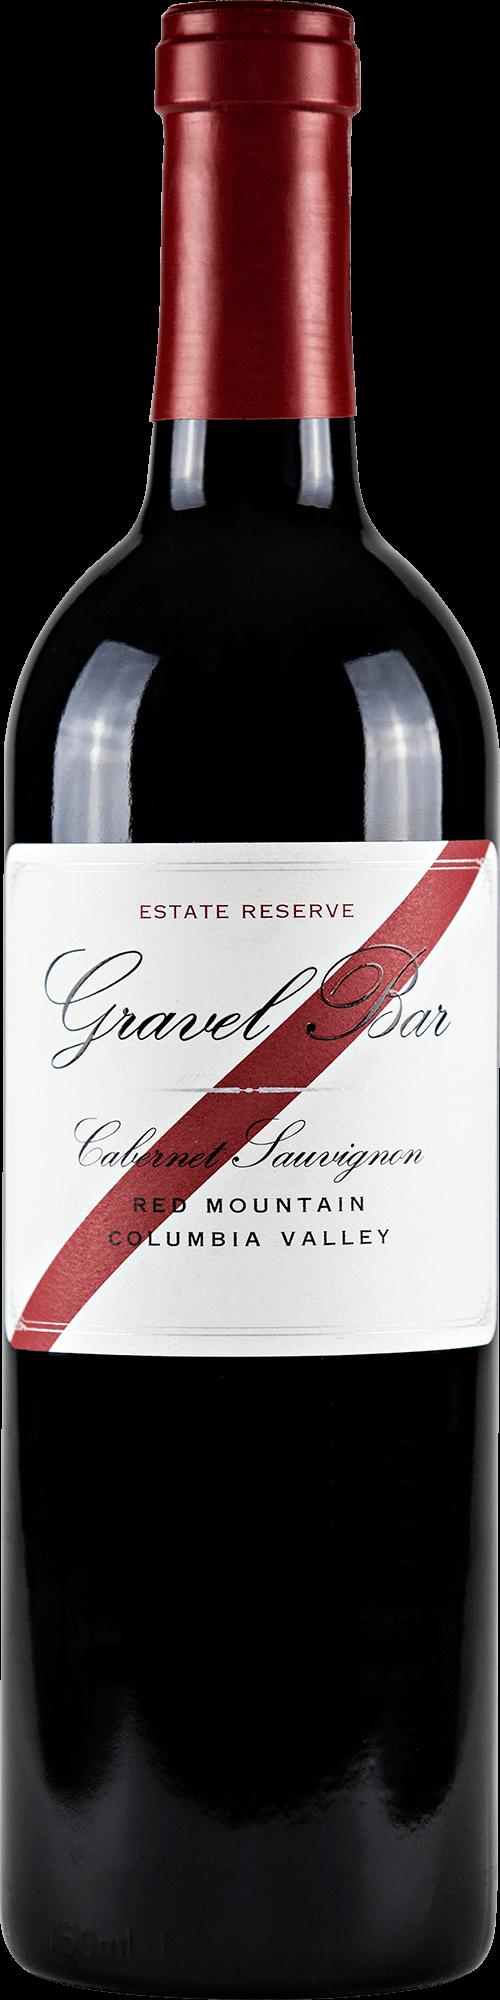 Gravel Bar Cabernet Sauvignon Reserve Bottleshot